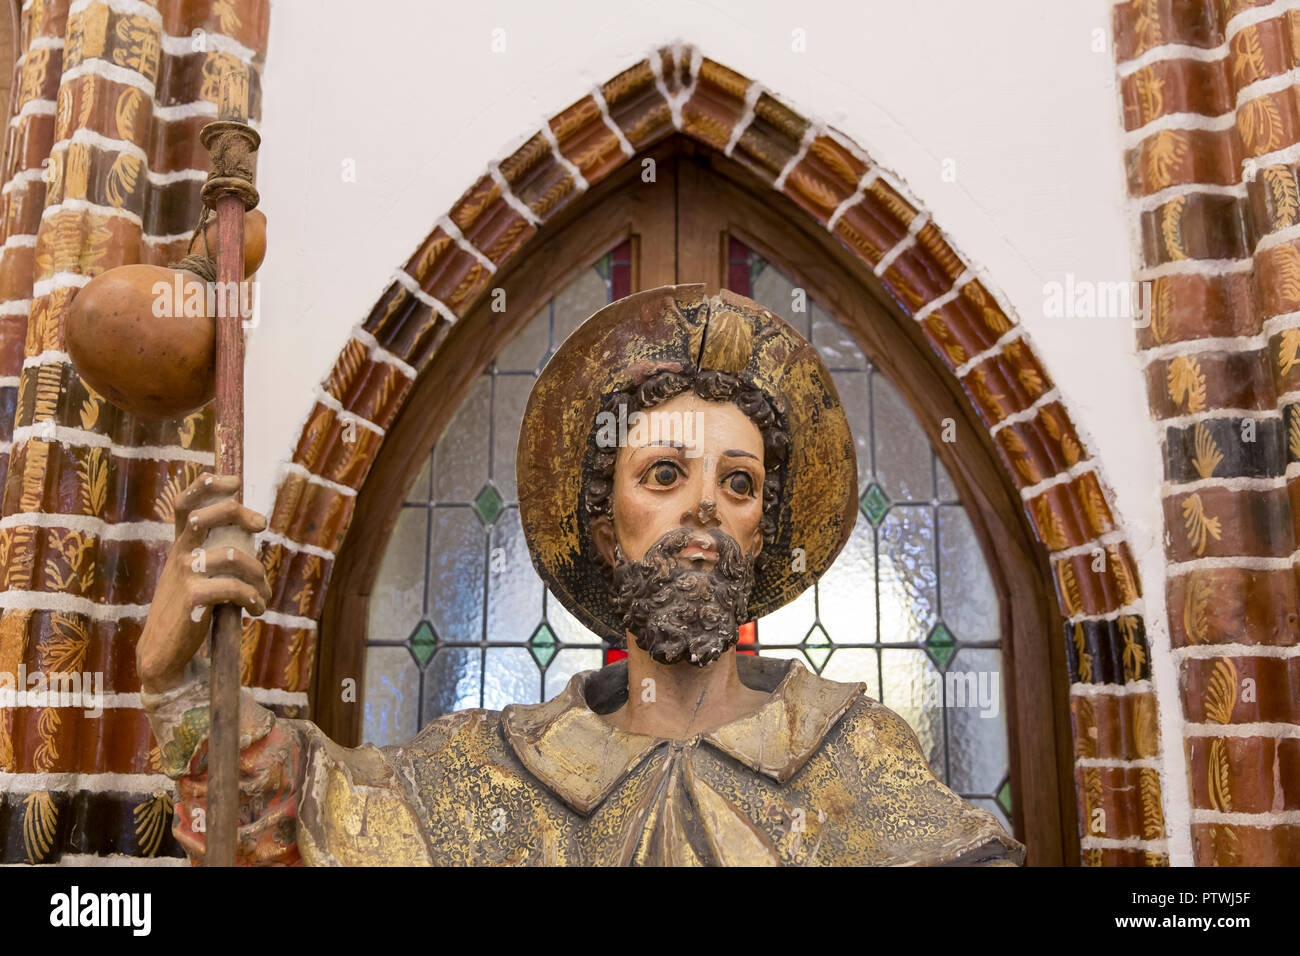 Astorga, Spain: 17th century statue of Saint James as a Jacobean pilgrim (Santiago Peregrino) at El Museo de los Caminos in the Episcopal Palace of As - Stock Image